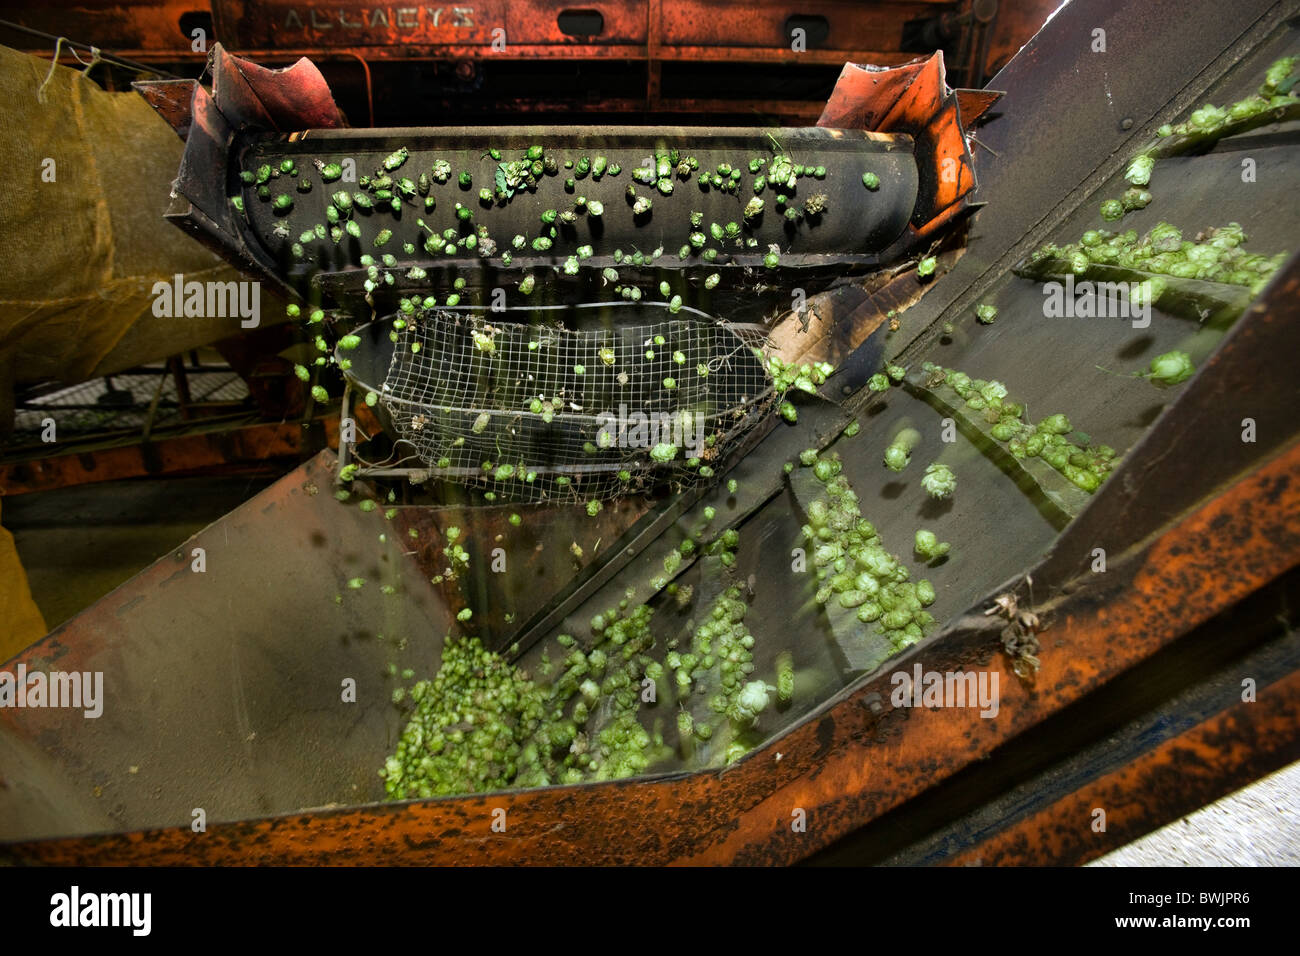 Produktion von Hopfen (Humulus Lupulus), Poperinge, Belgien Stockbild